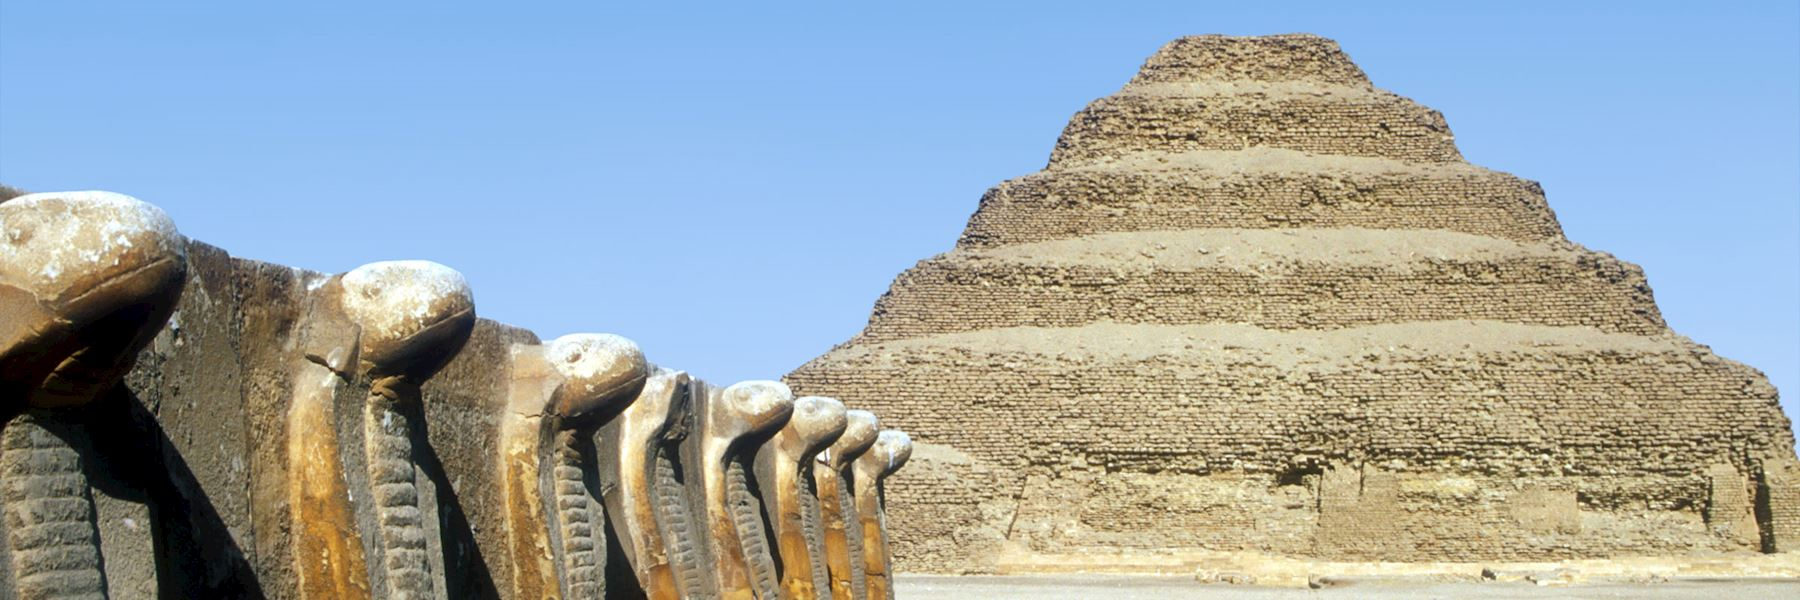 Visit Saqqara, Egypt